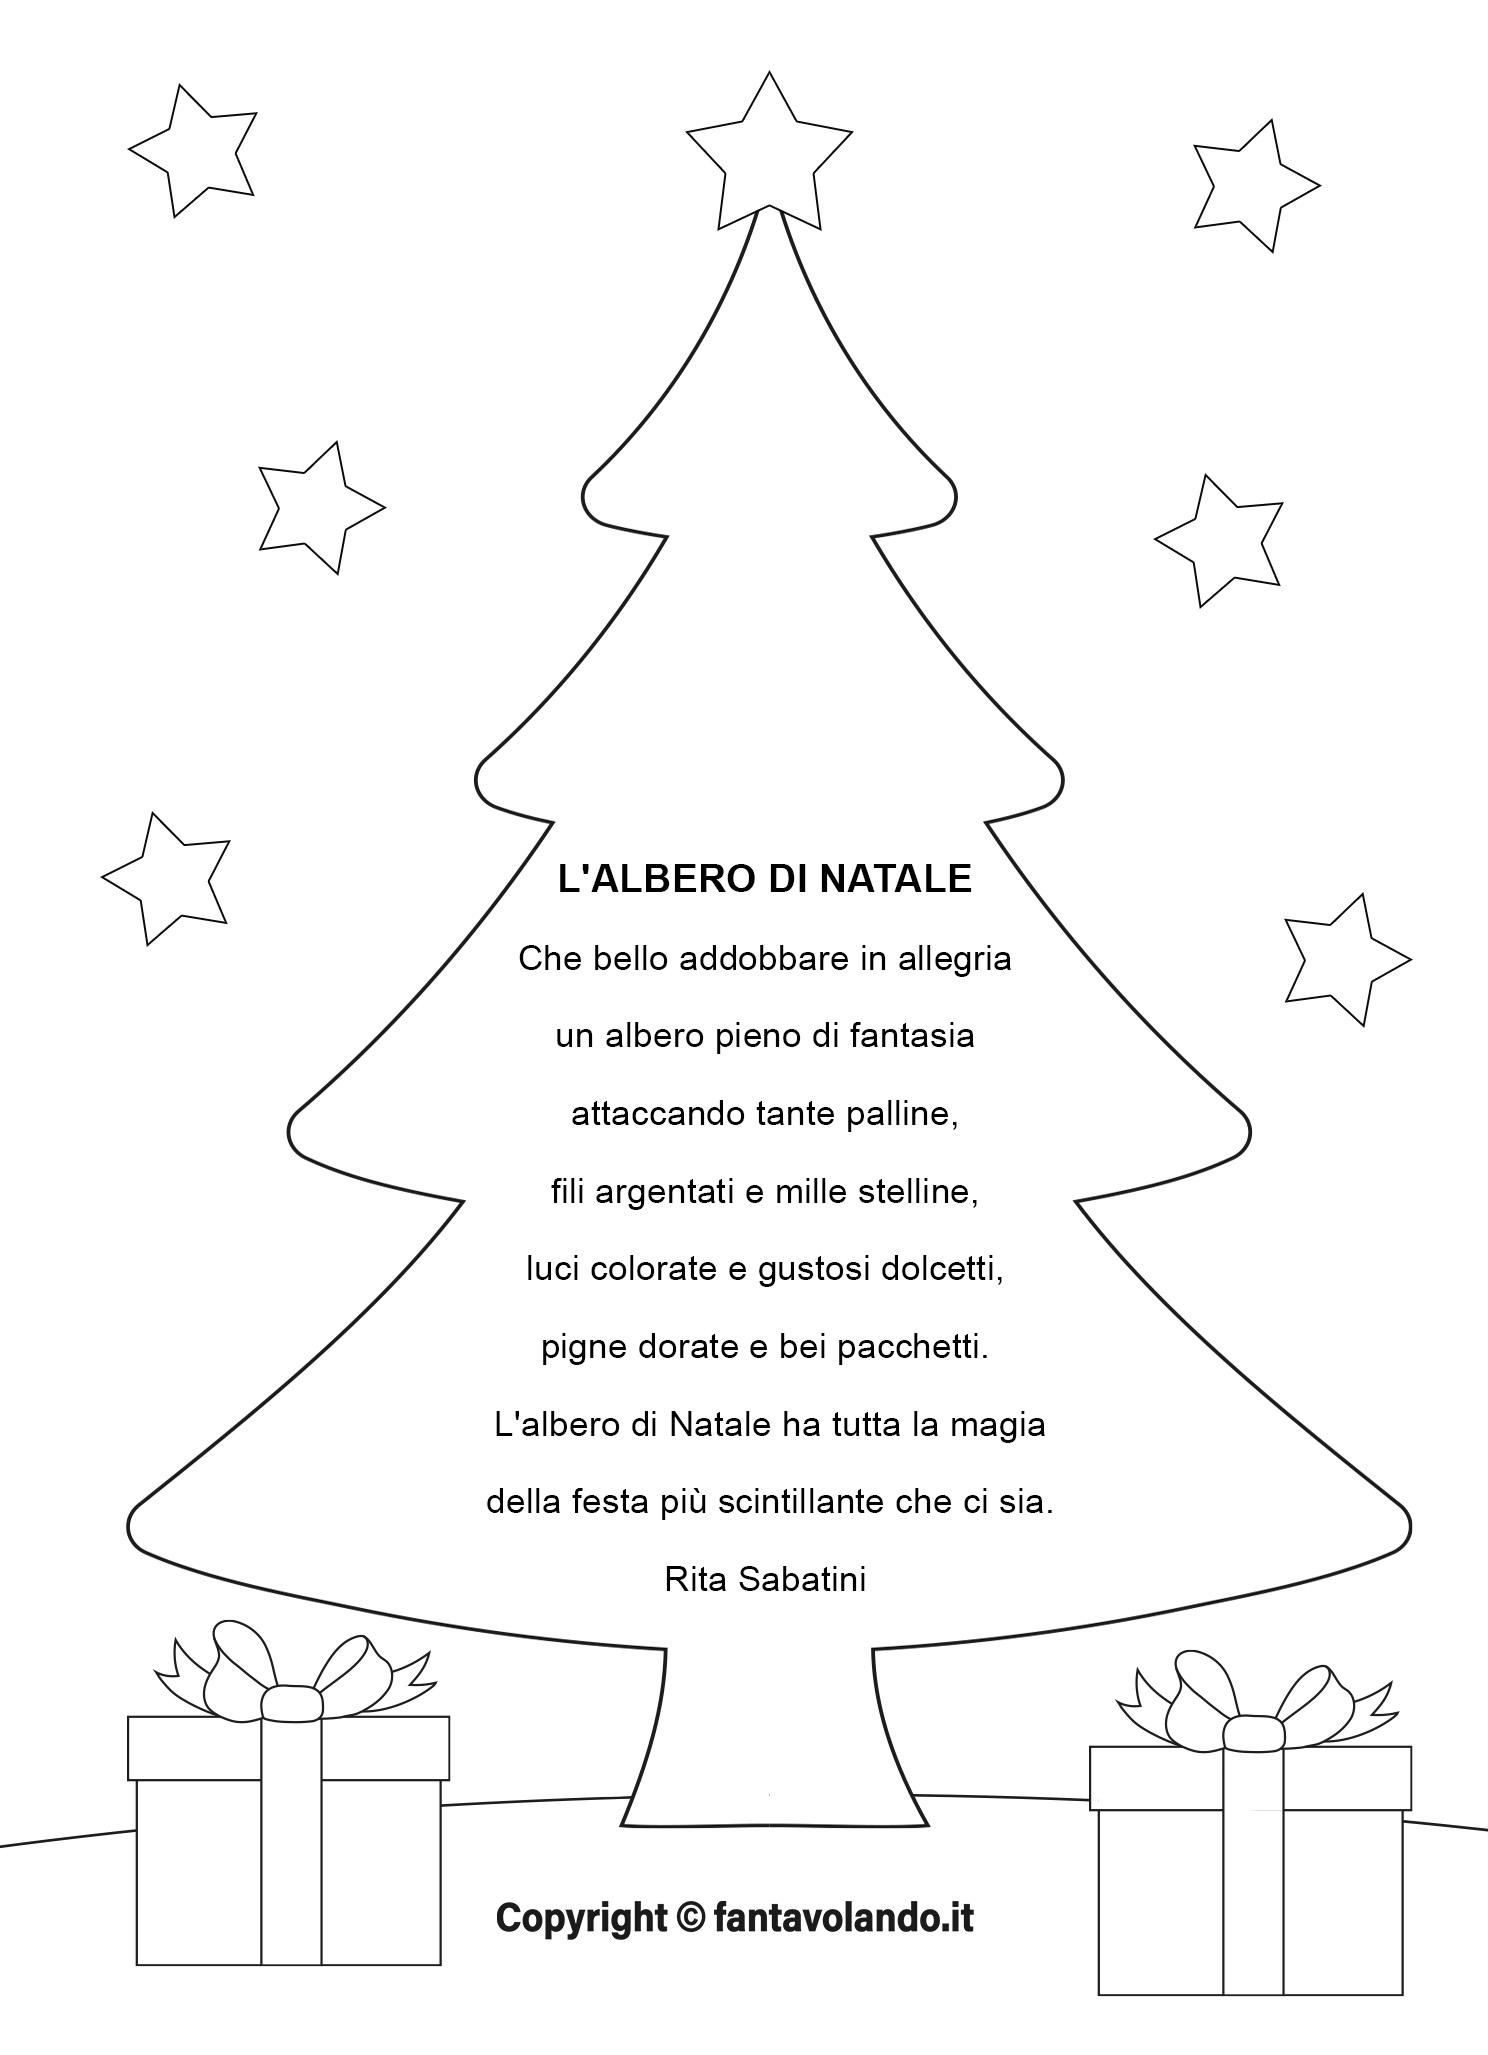 Poesie Di Natale In Inglese Per Bambini.Poesie Per Natale Fantavolando